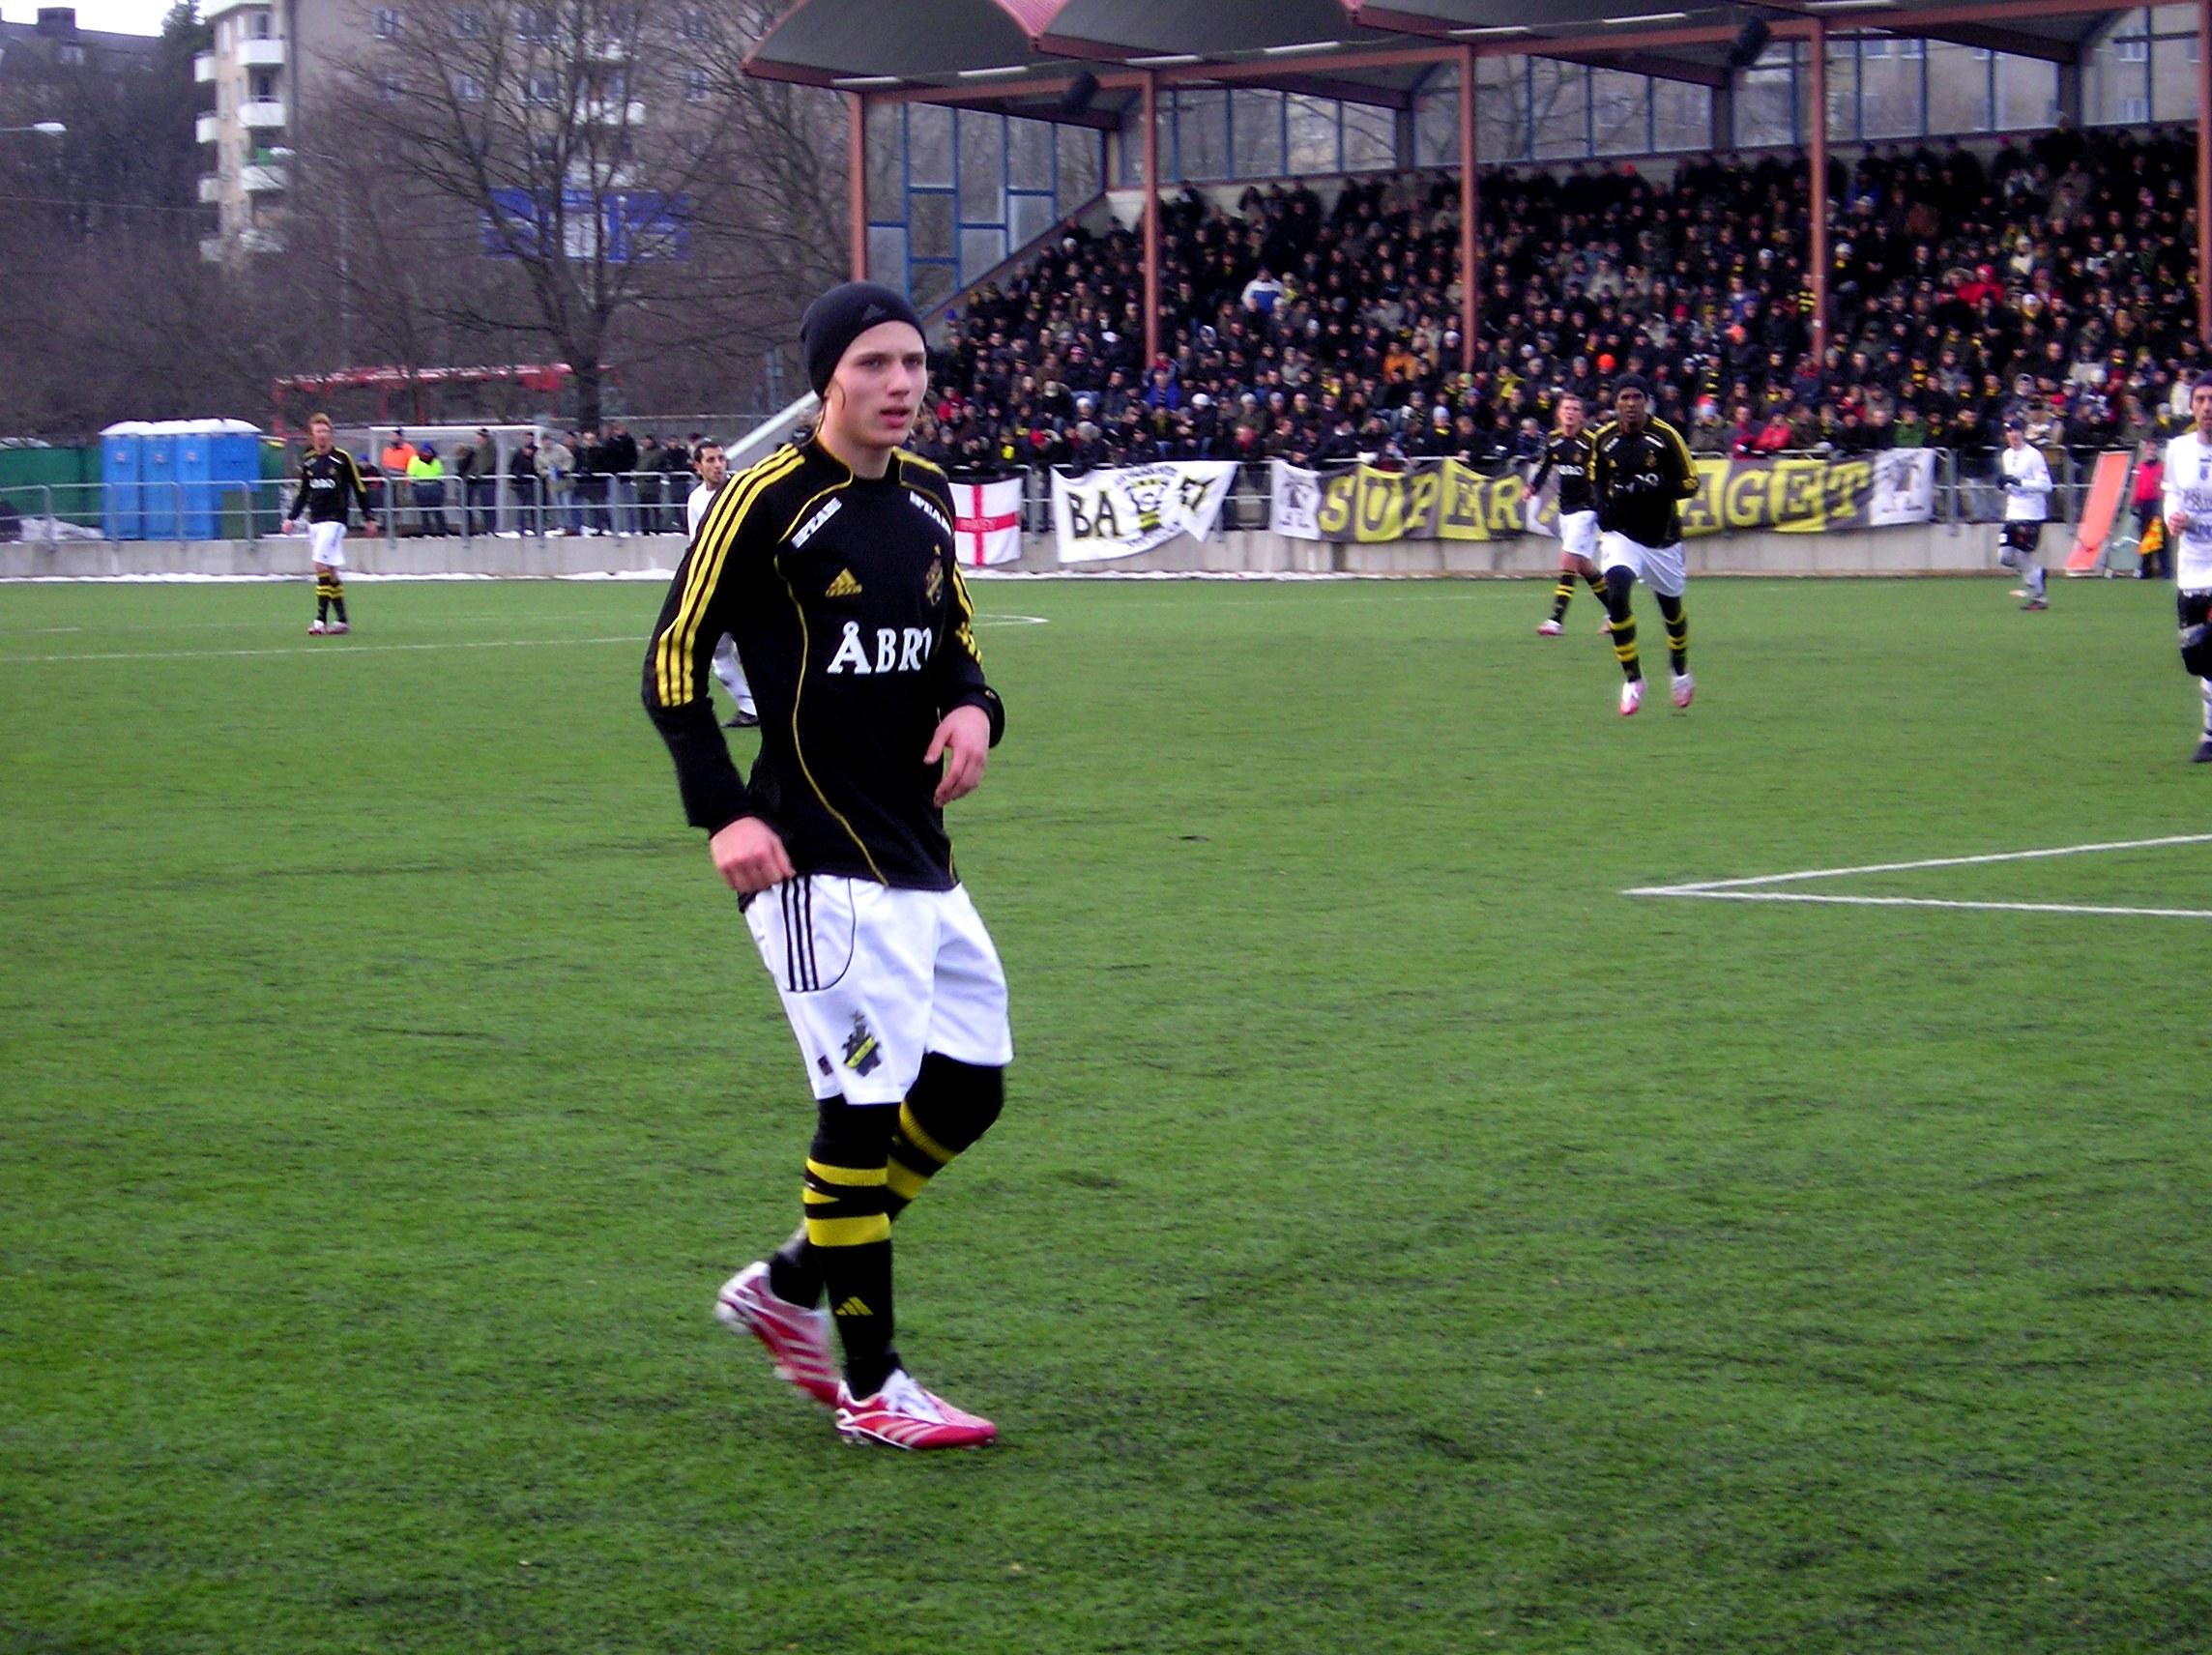 AIK Fotboll videos